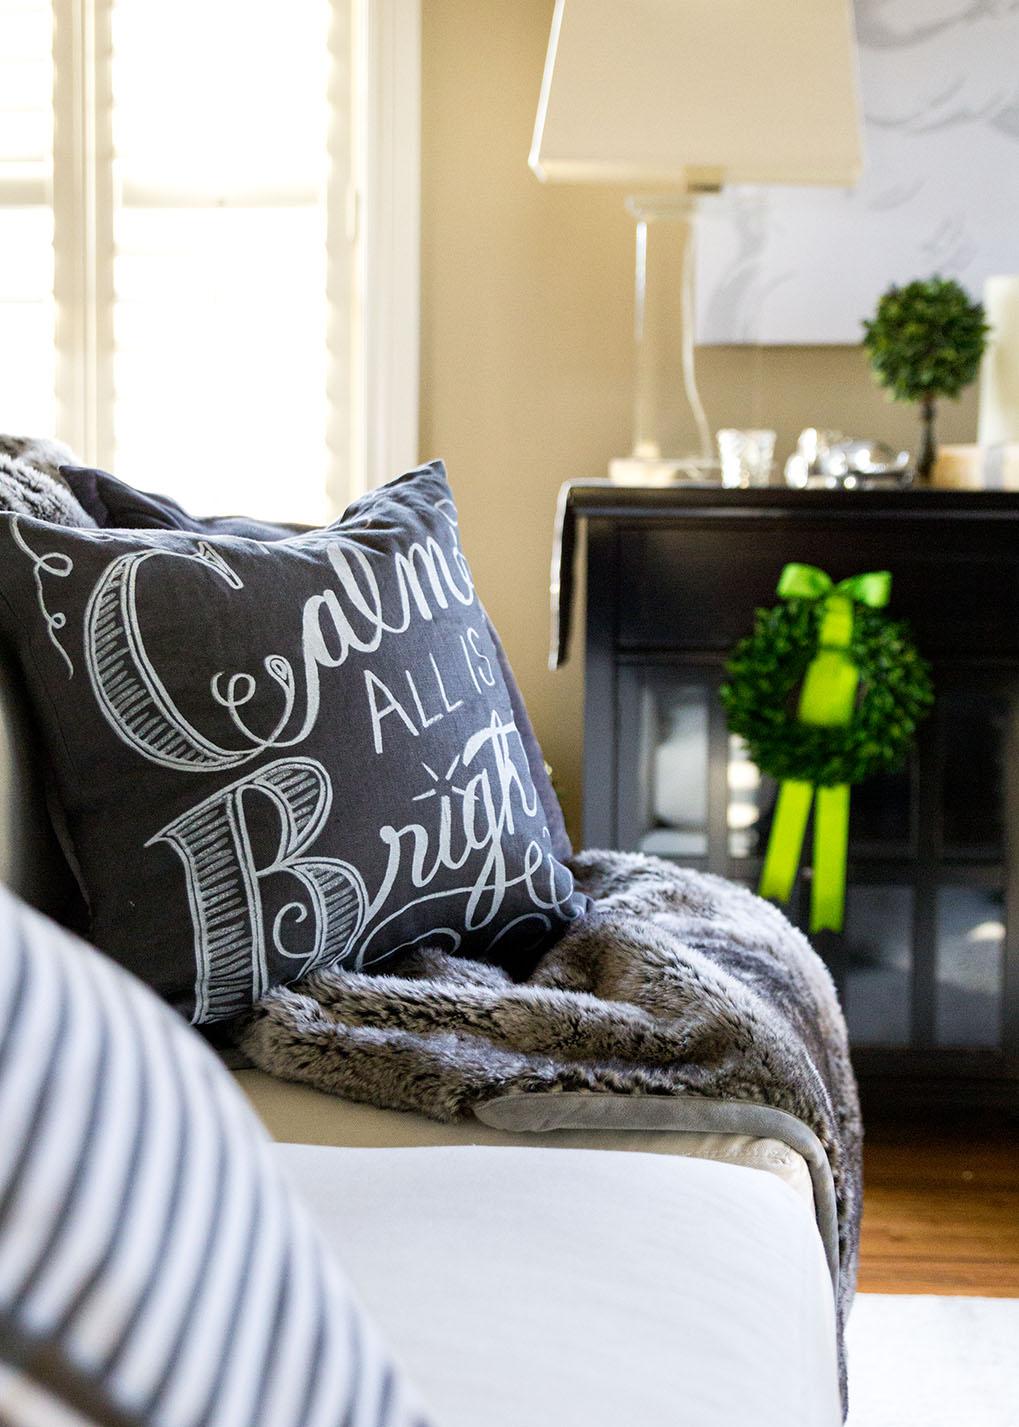 Calm & Bright Pillow - Pottery Barn